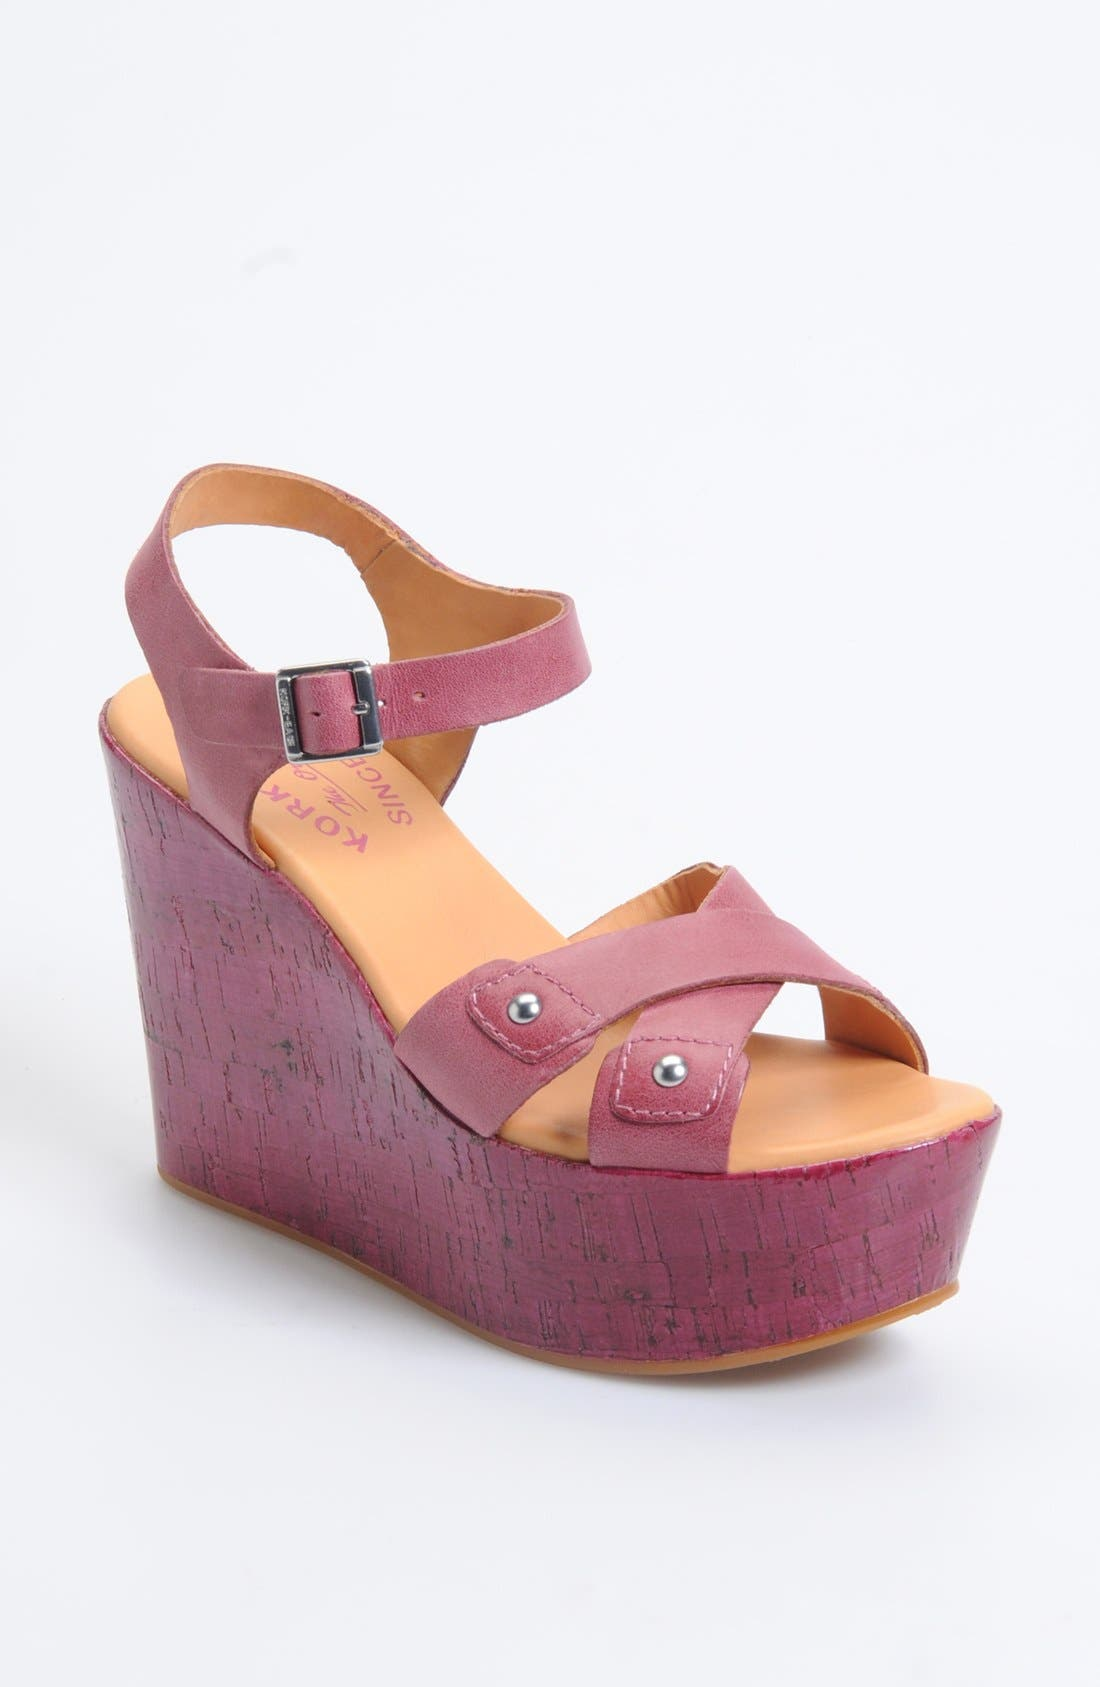 Alternate Image 1 Selected - Kork-Ease 'Jaclyn' Sandal